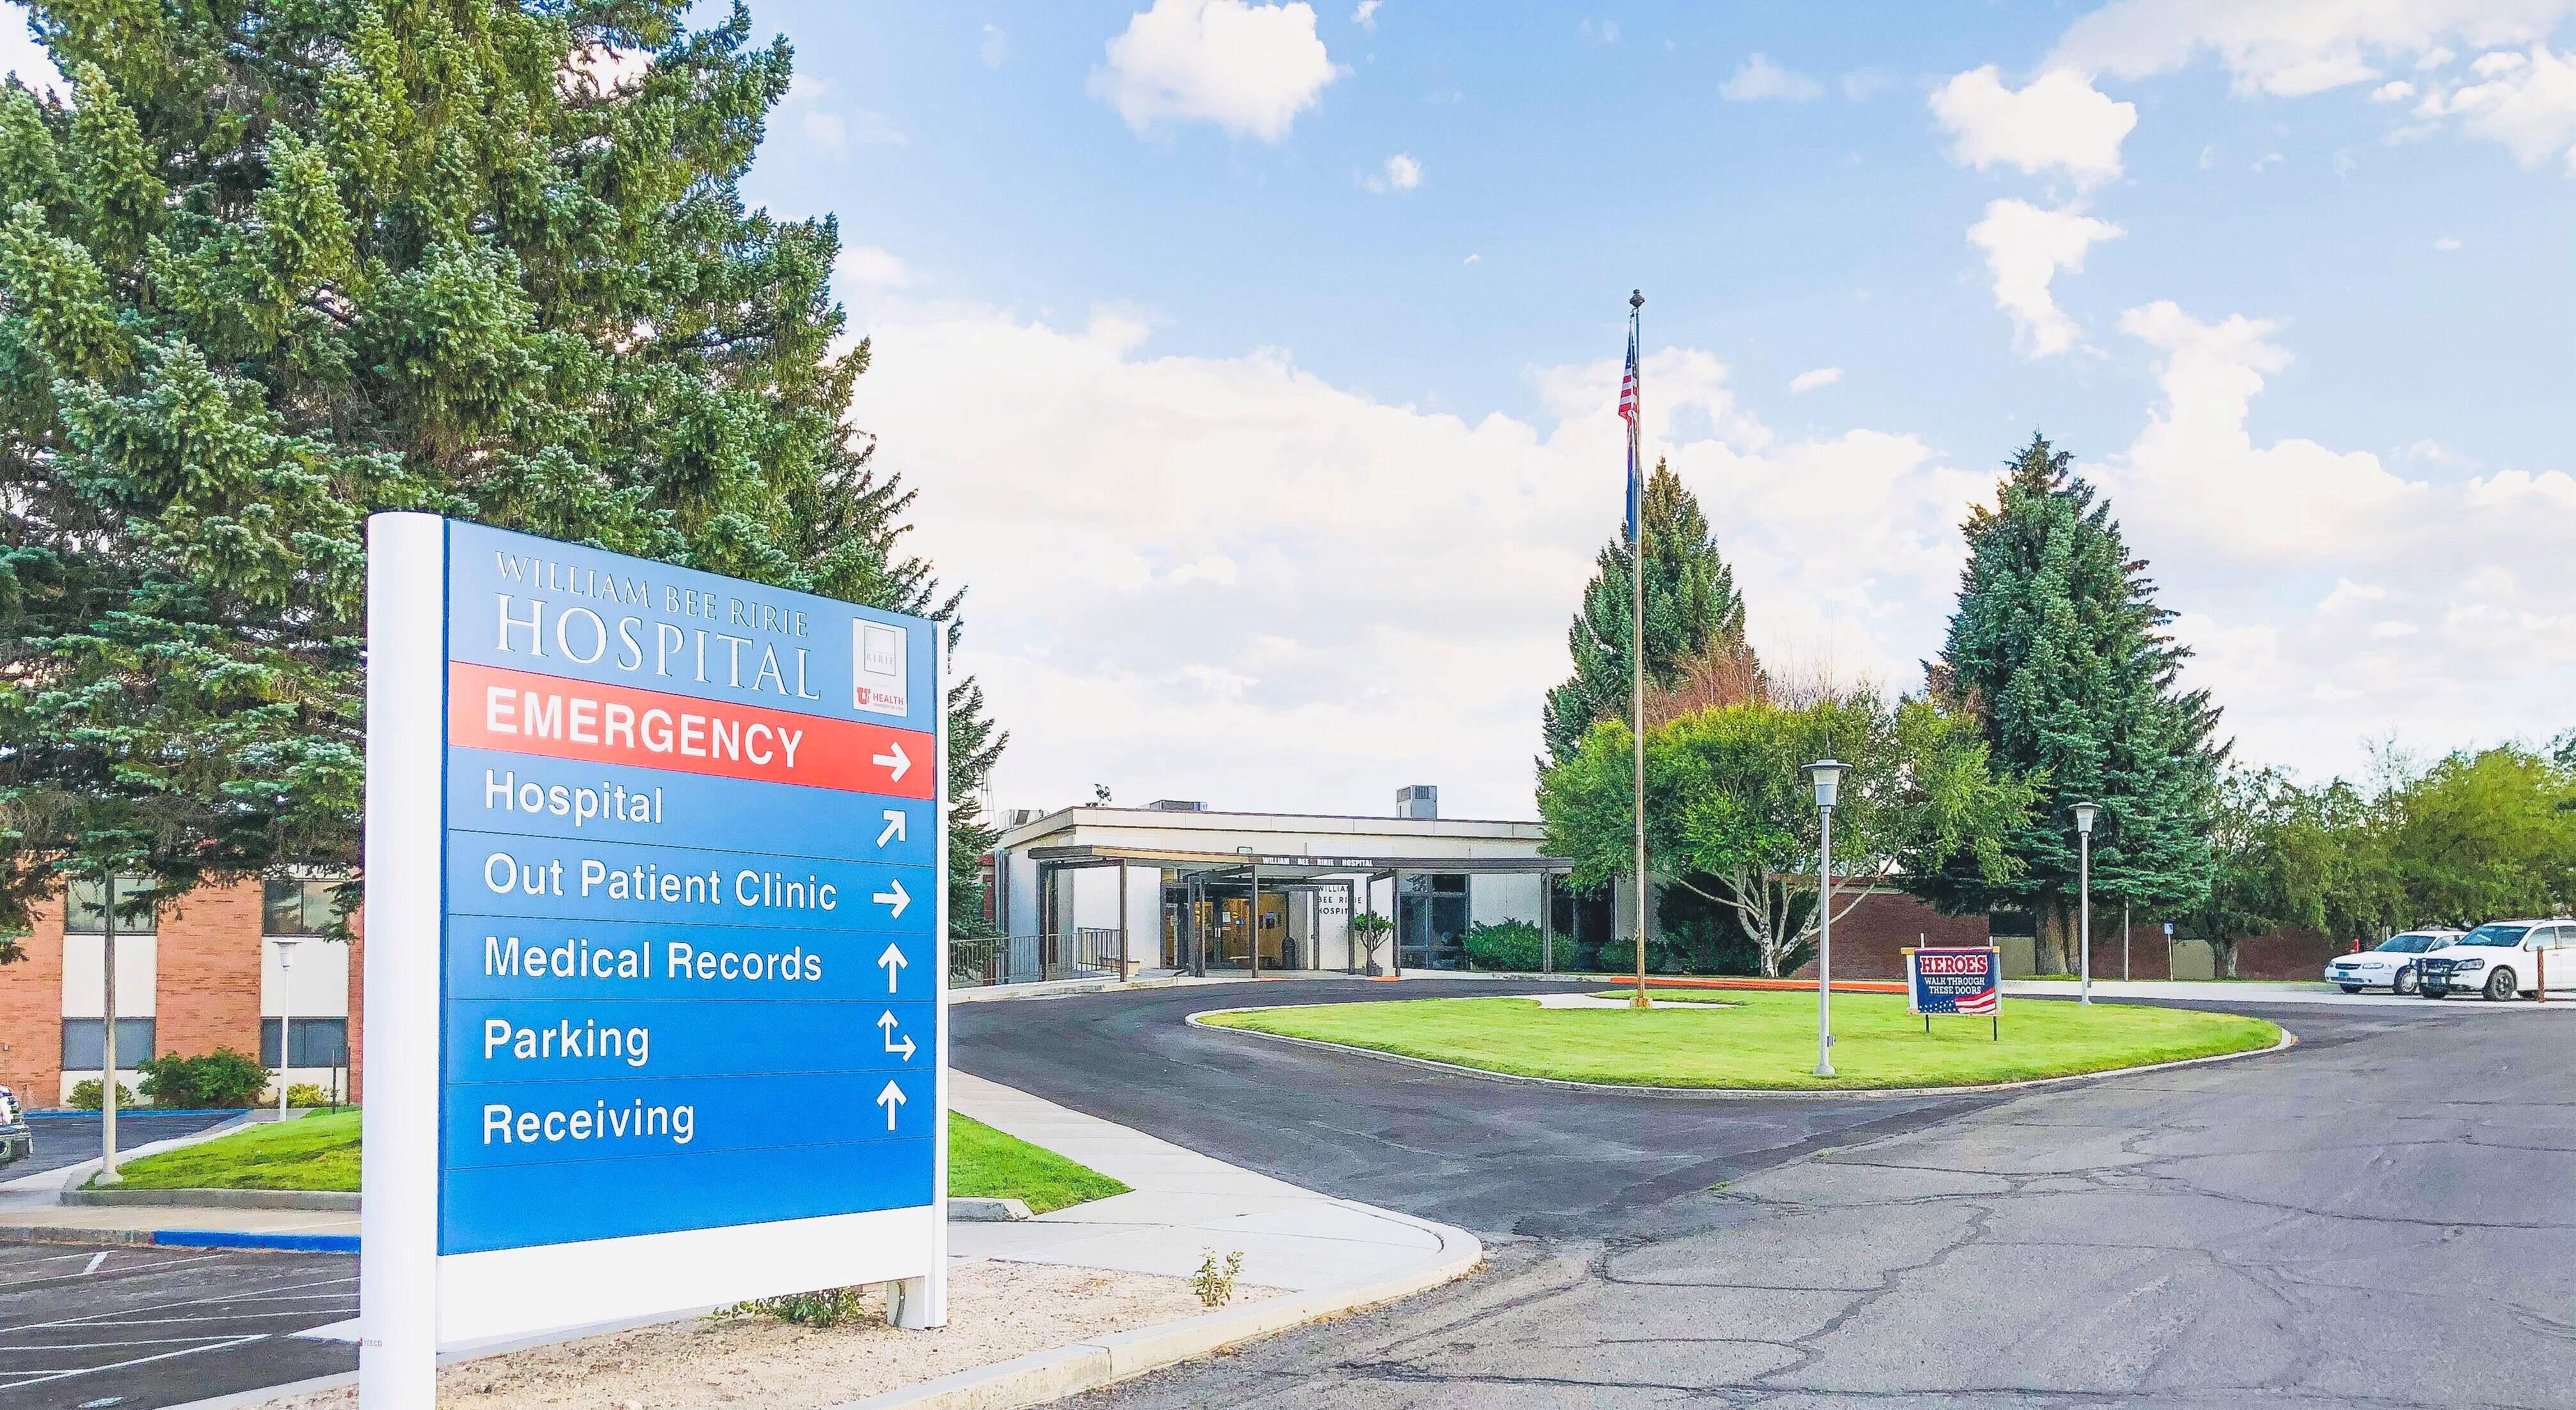 William Bee RirieCritical Access Hospital and RuralHealth Clinics